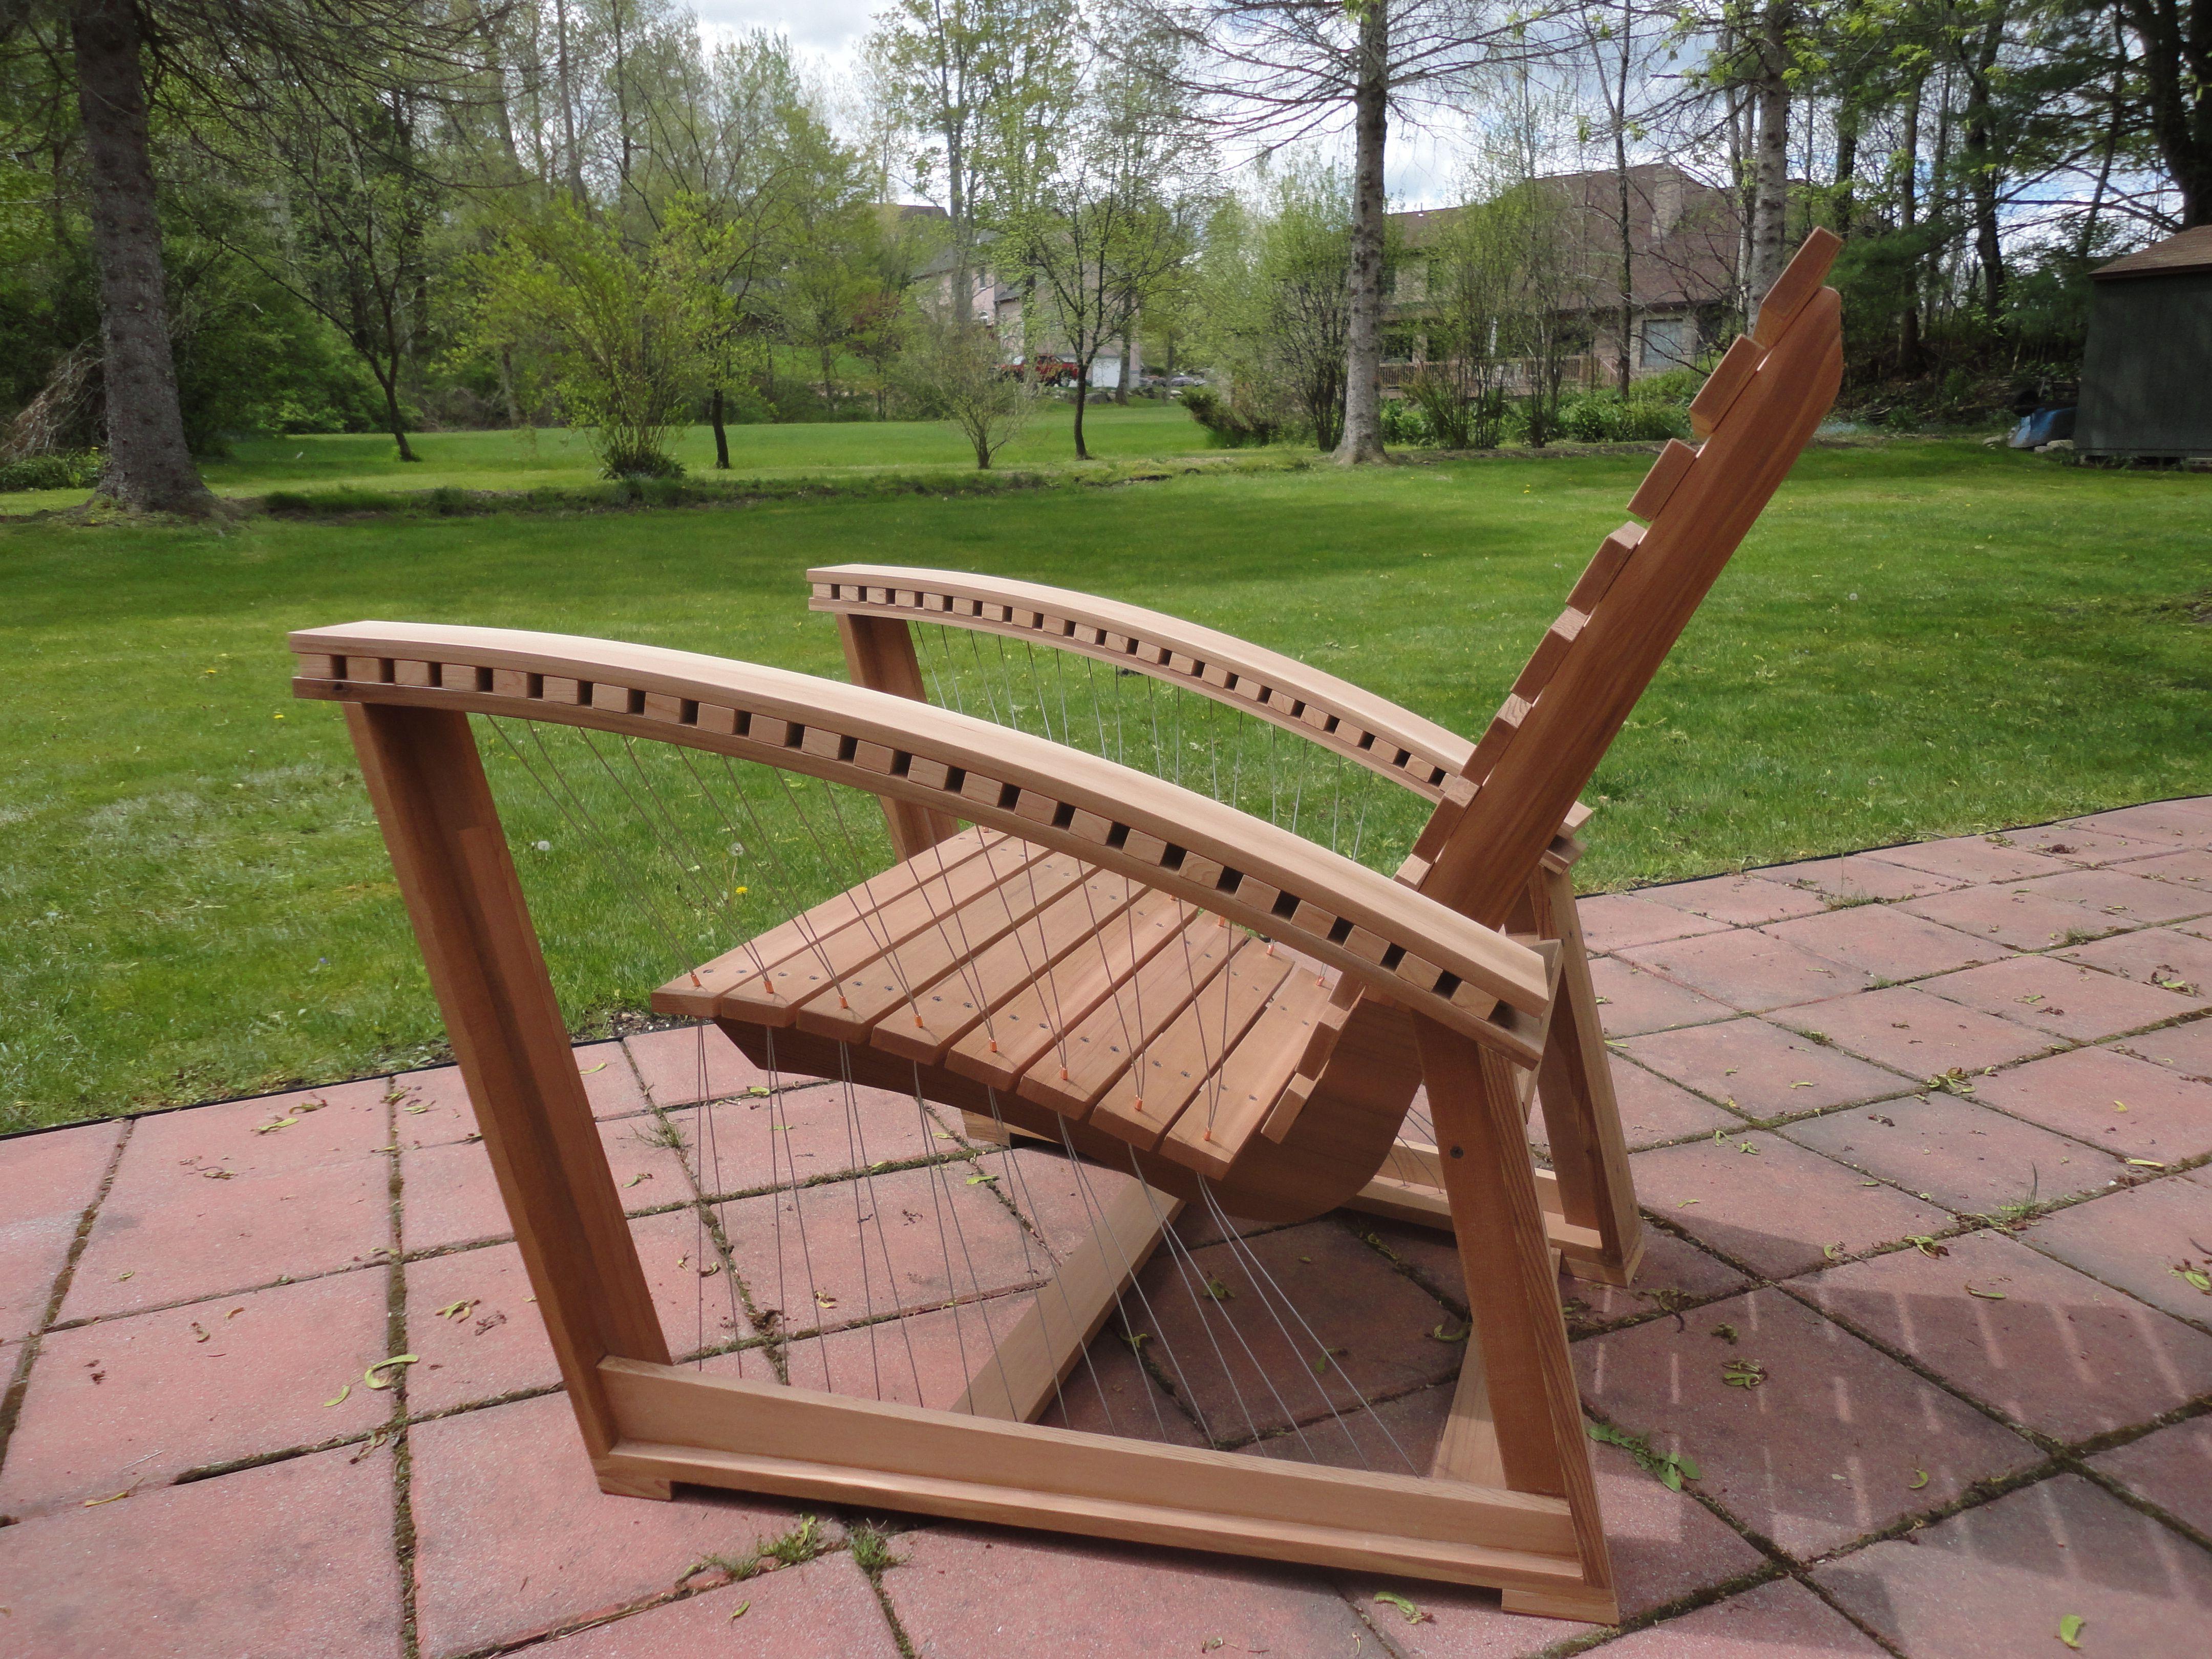 Beau Adirondack Chairs Blueprints Woodworking Plans Blueprints Download Wood  Screw Sizing Chartplywood Toy Box Plans Plans For Making Wood Shelves Slant  Top ...